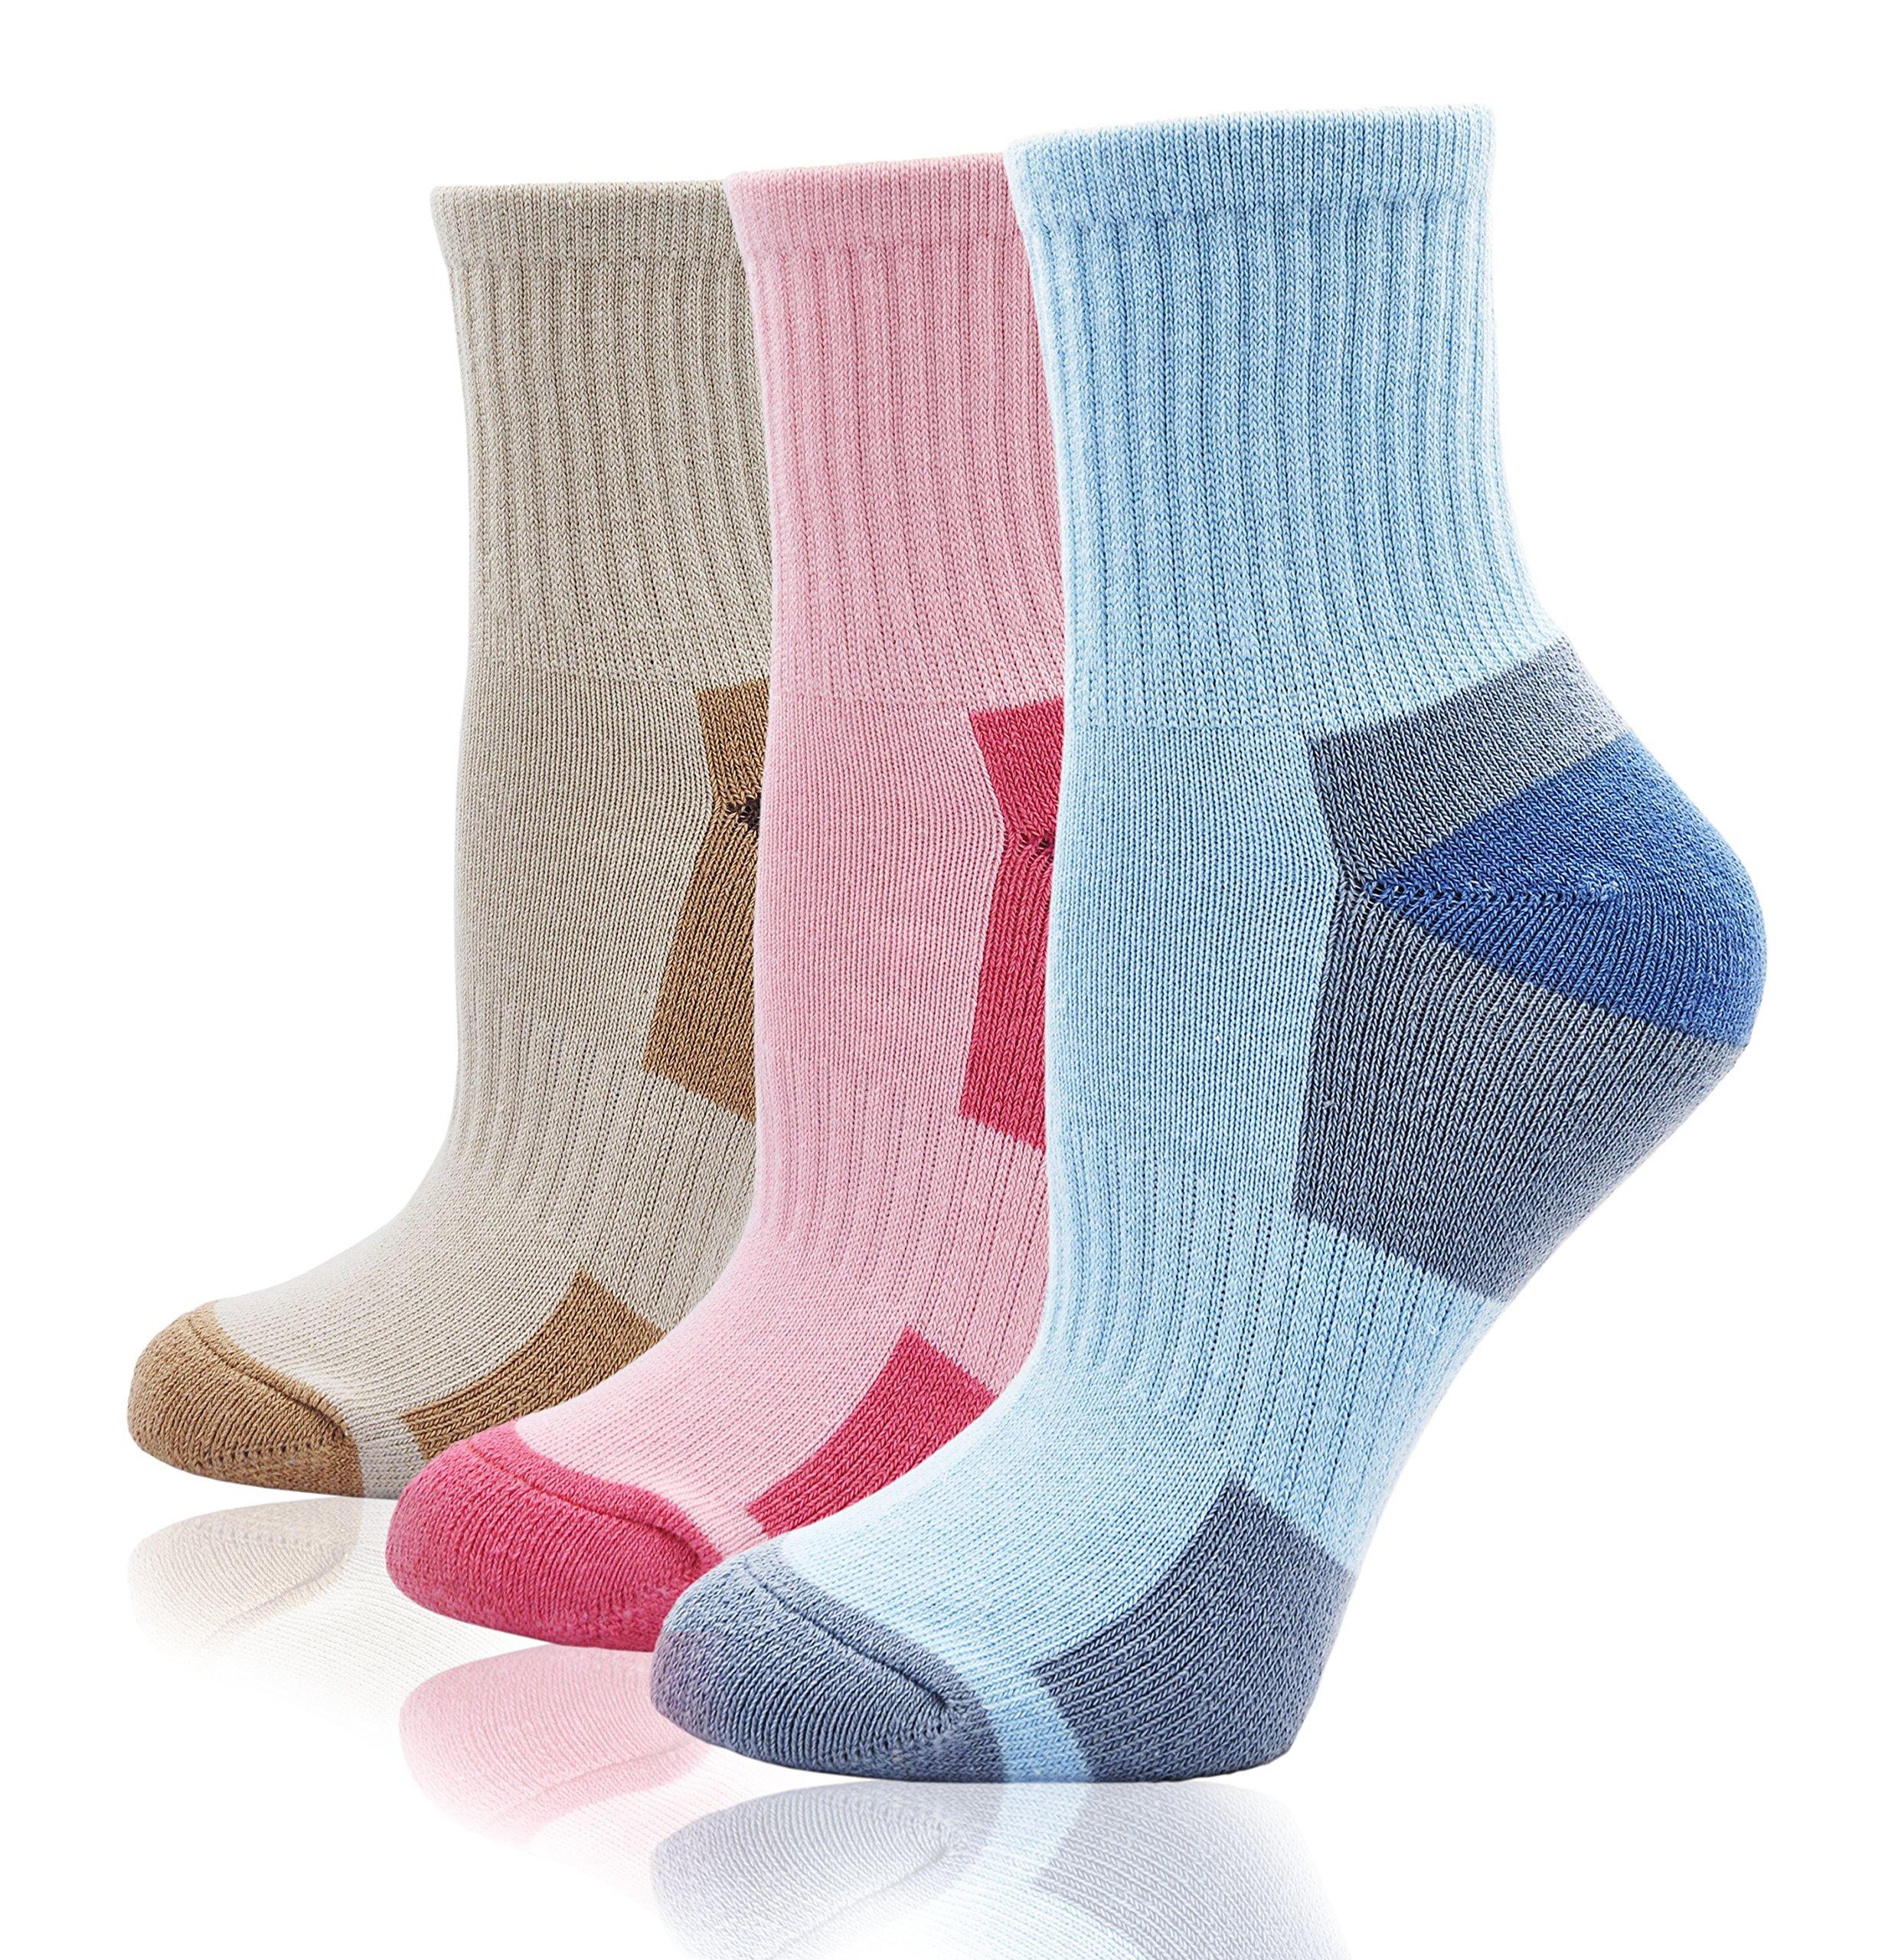 Women\'s Athletic Ankle Quarter Cushion Socks Thick Cotton Padded Mini Crew Socks for Hiking Trekking Tennis Running Fitness